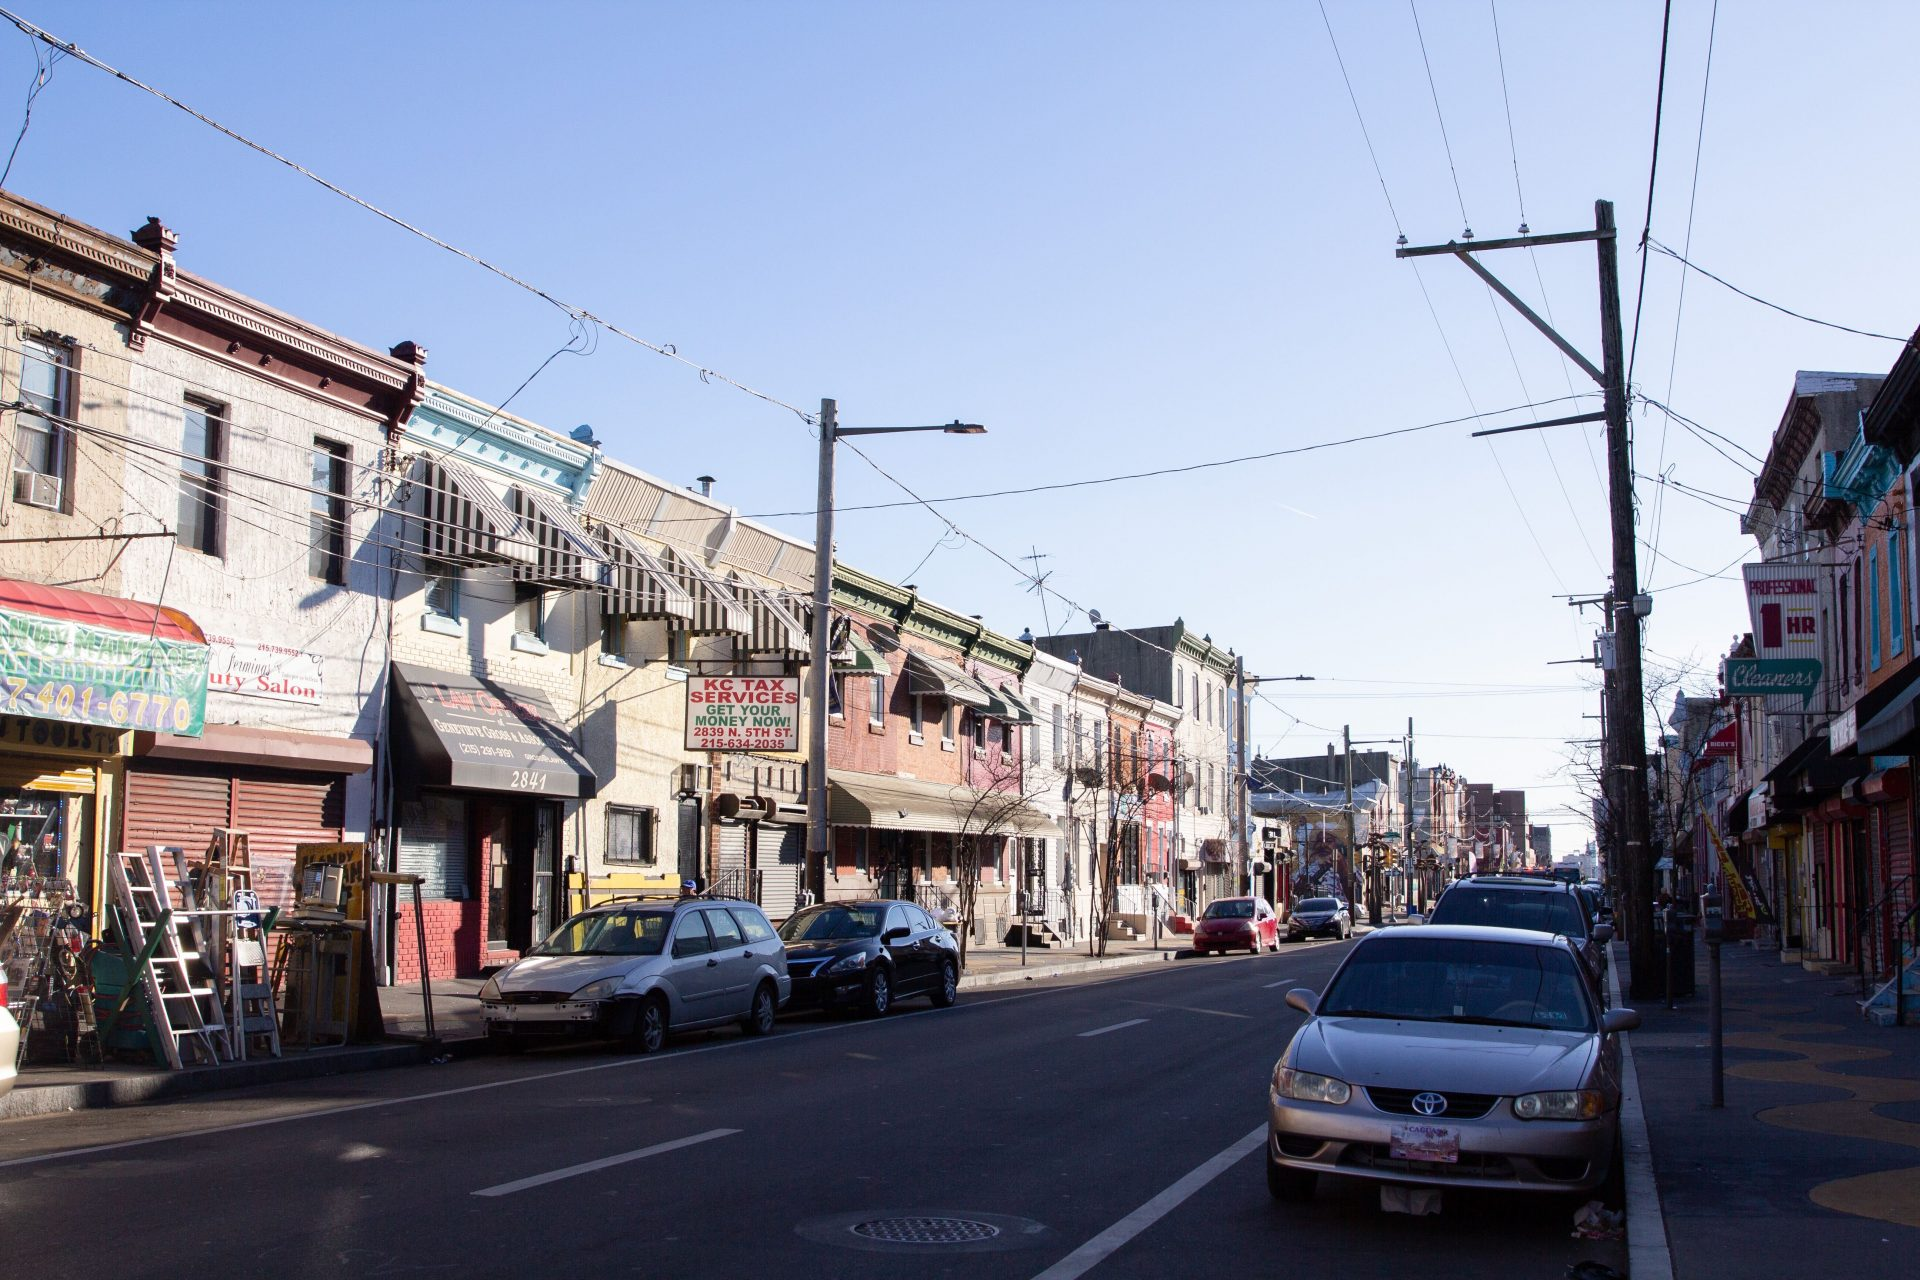 North 5th and Cambria Streets in Philadelphia.